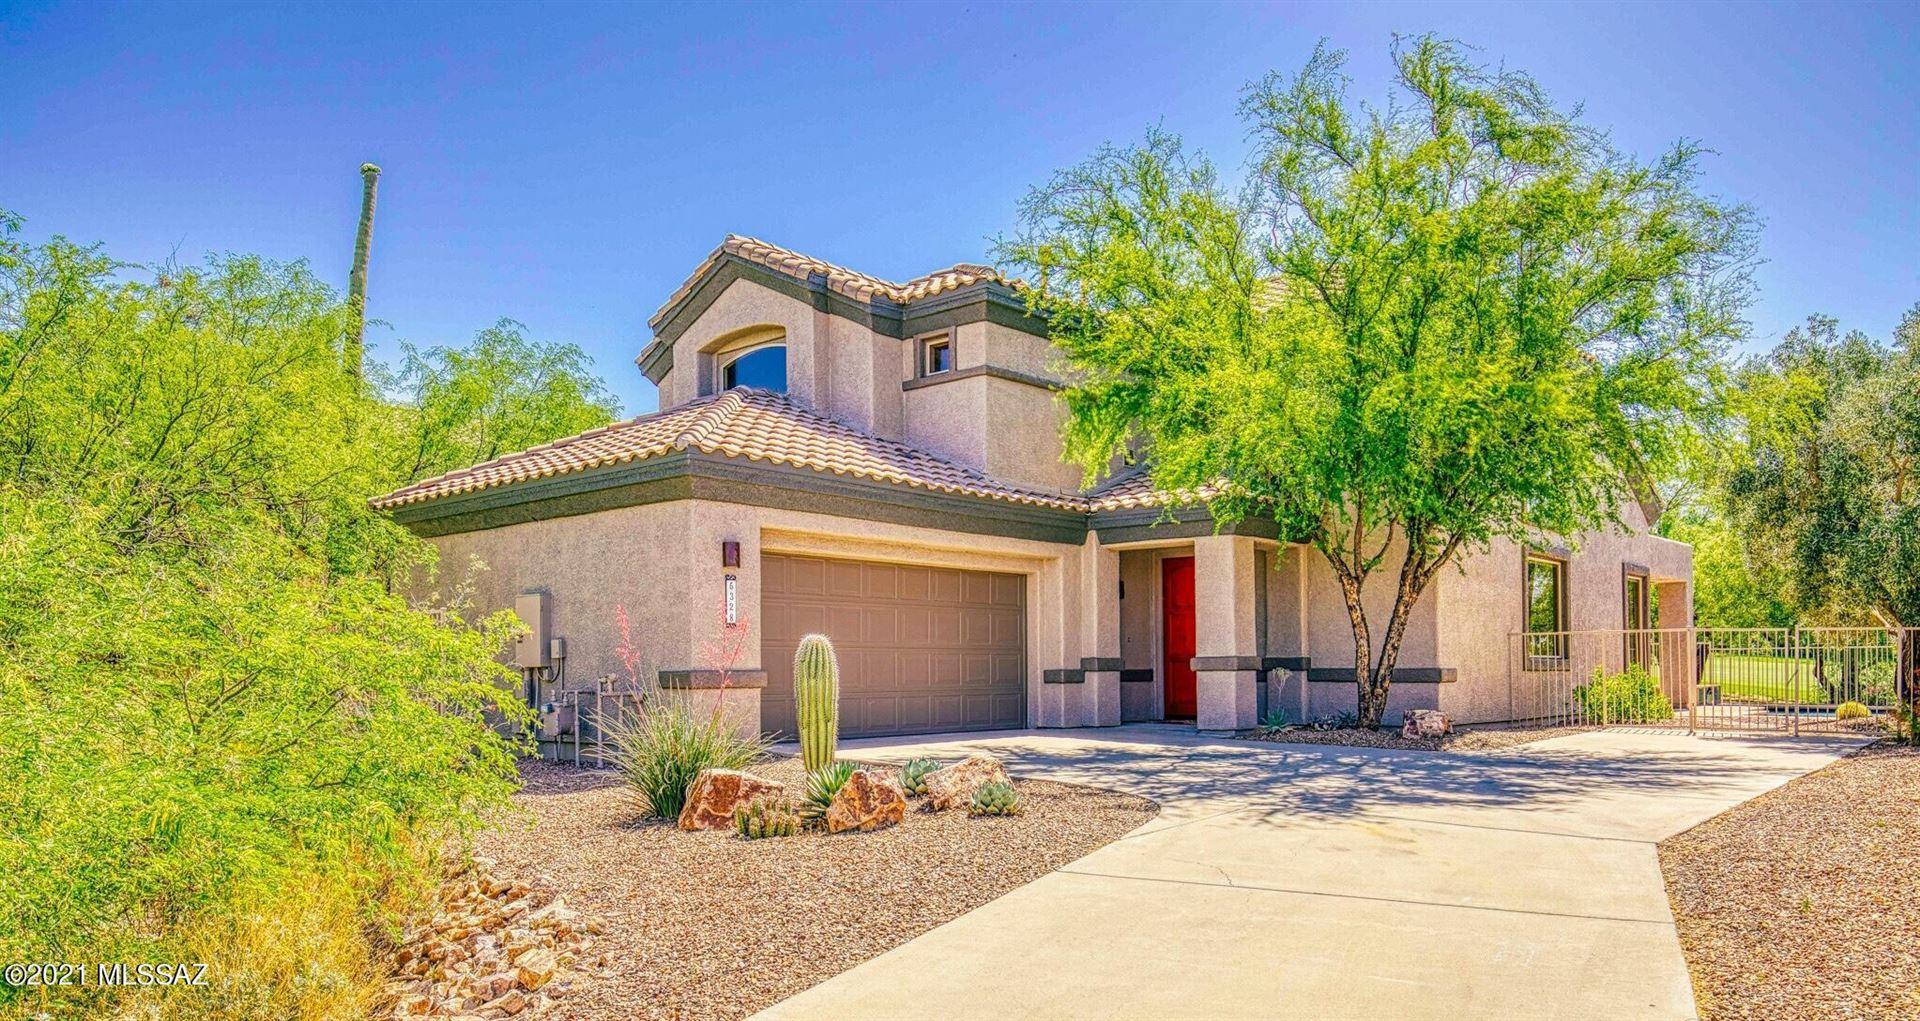 5328 Spring View Drive, Tucson, AZ 85749 - MLS#: 22122979